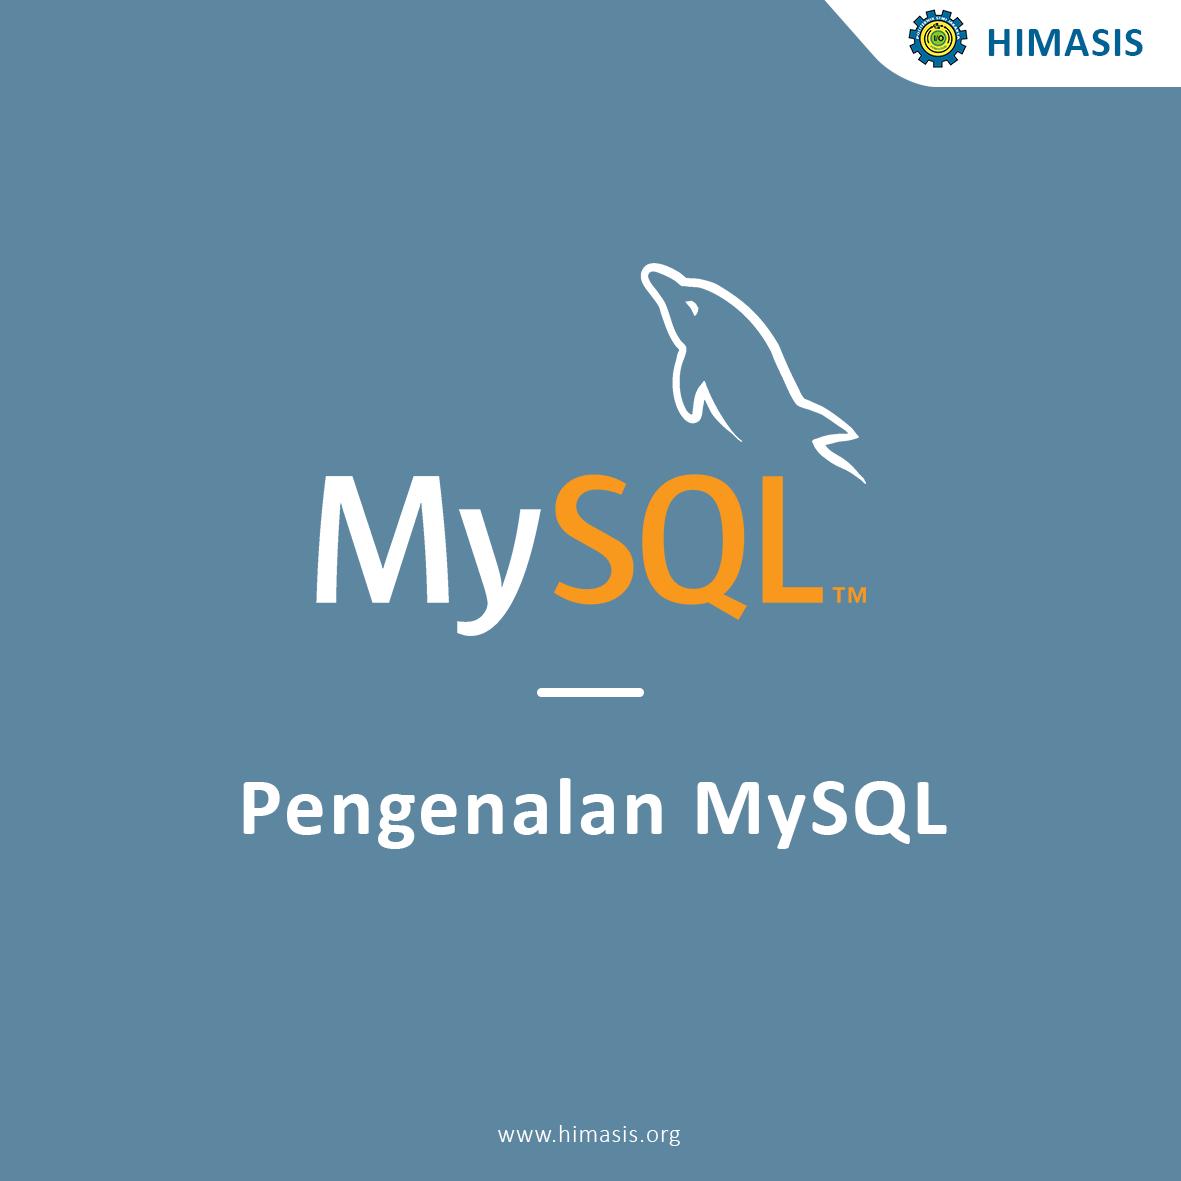 Pengenalan MySQL